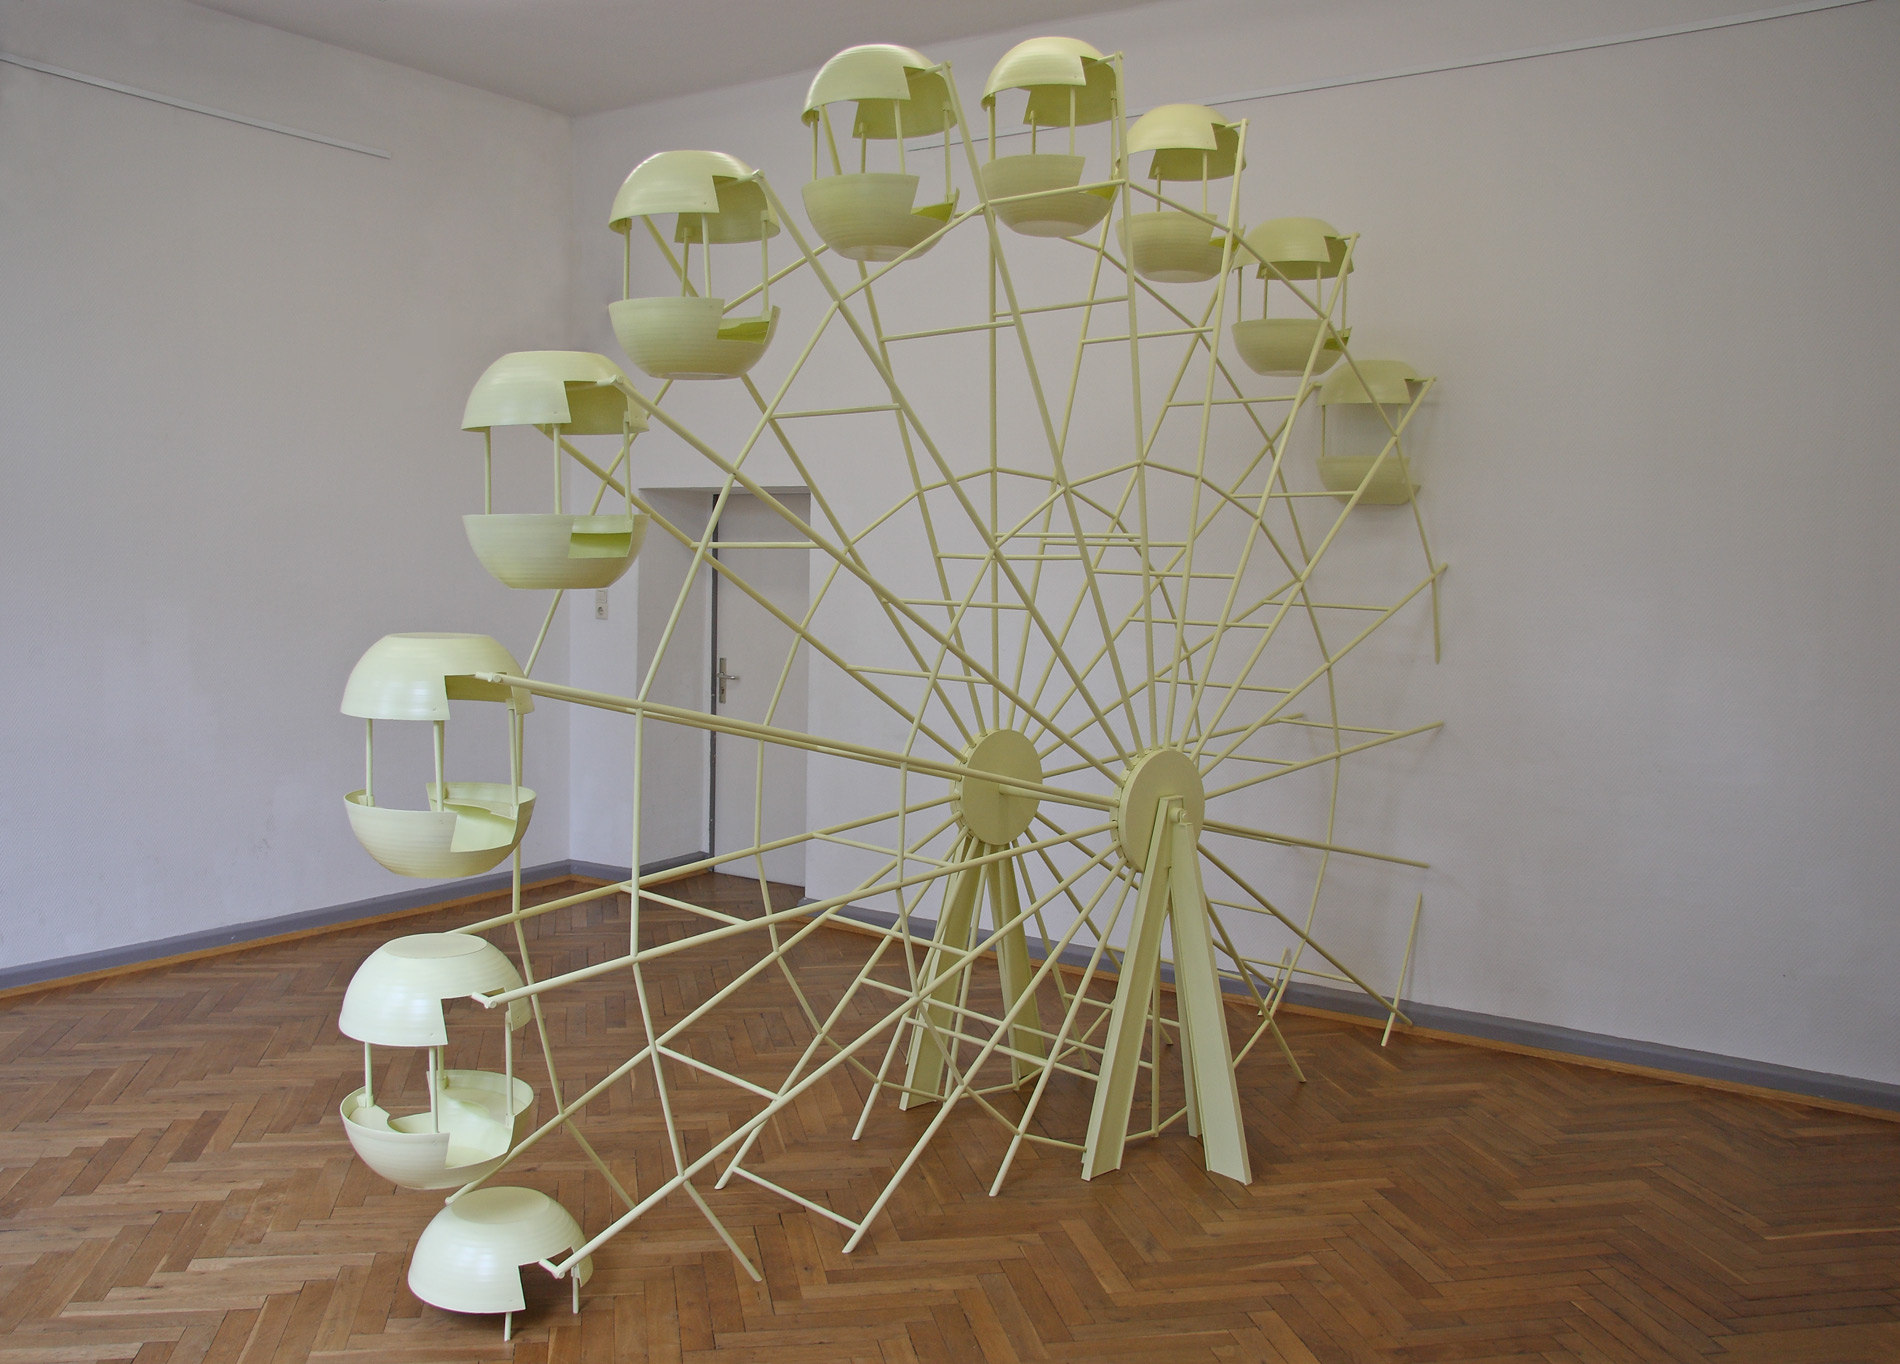 Michael Göbel - Deadlock (Prypjat), 2009